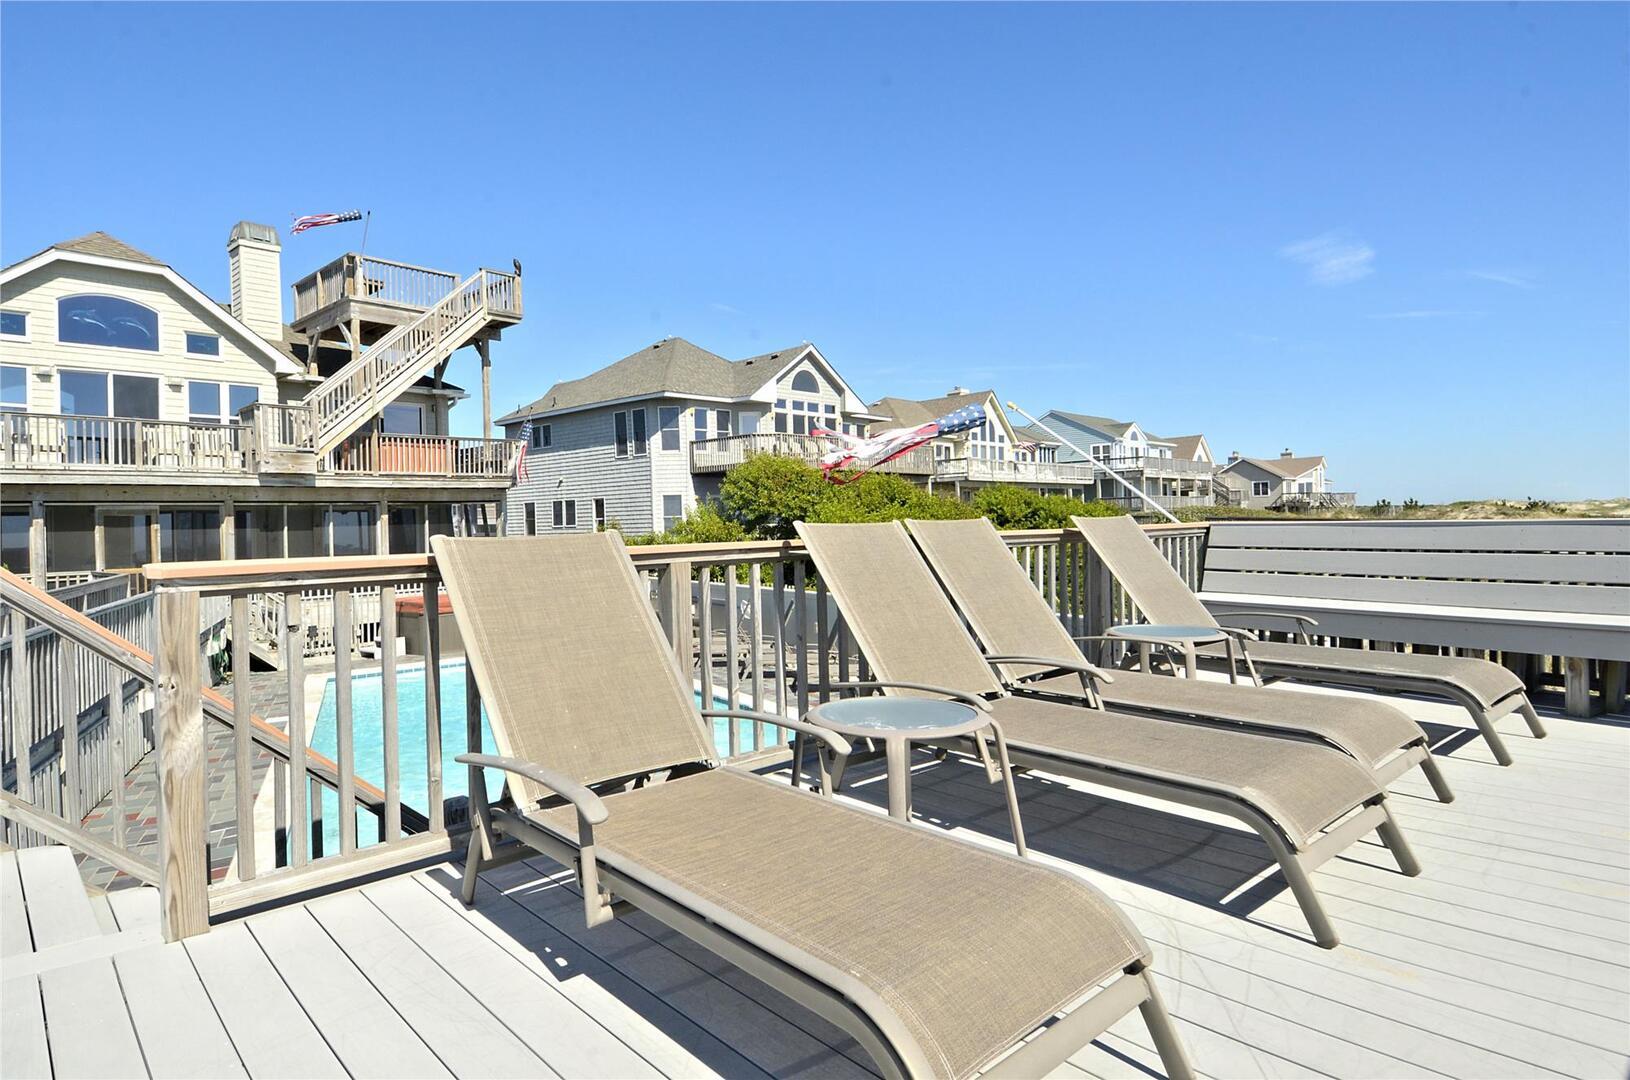 Pool,Lounge Area,